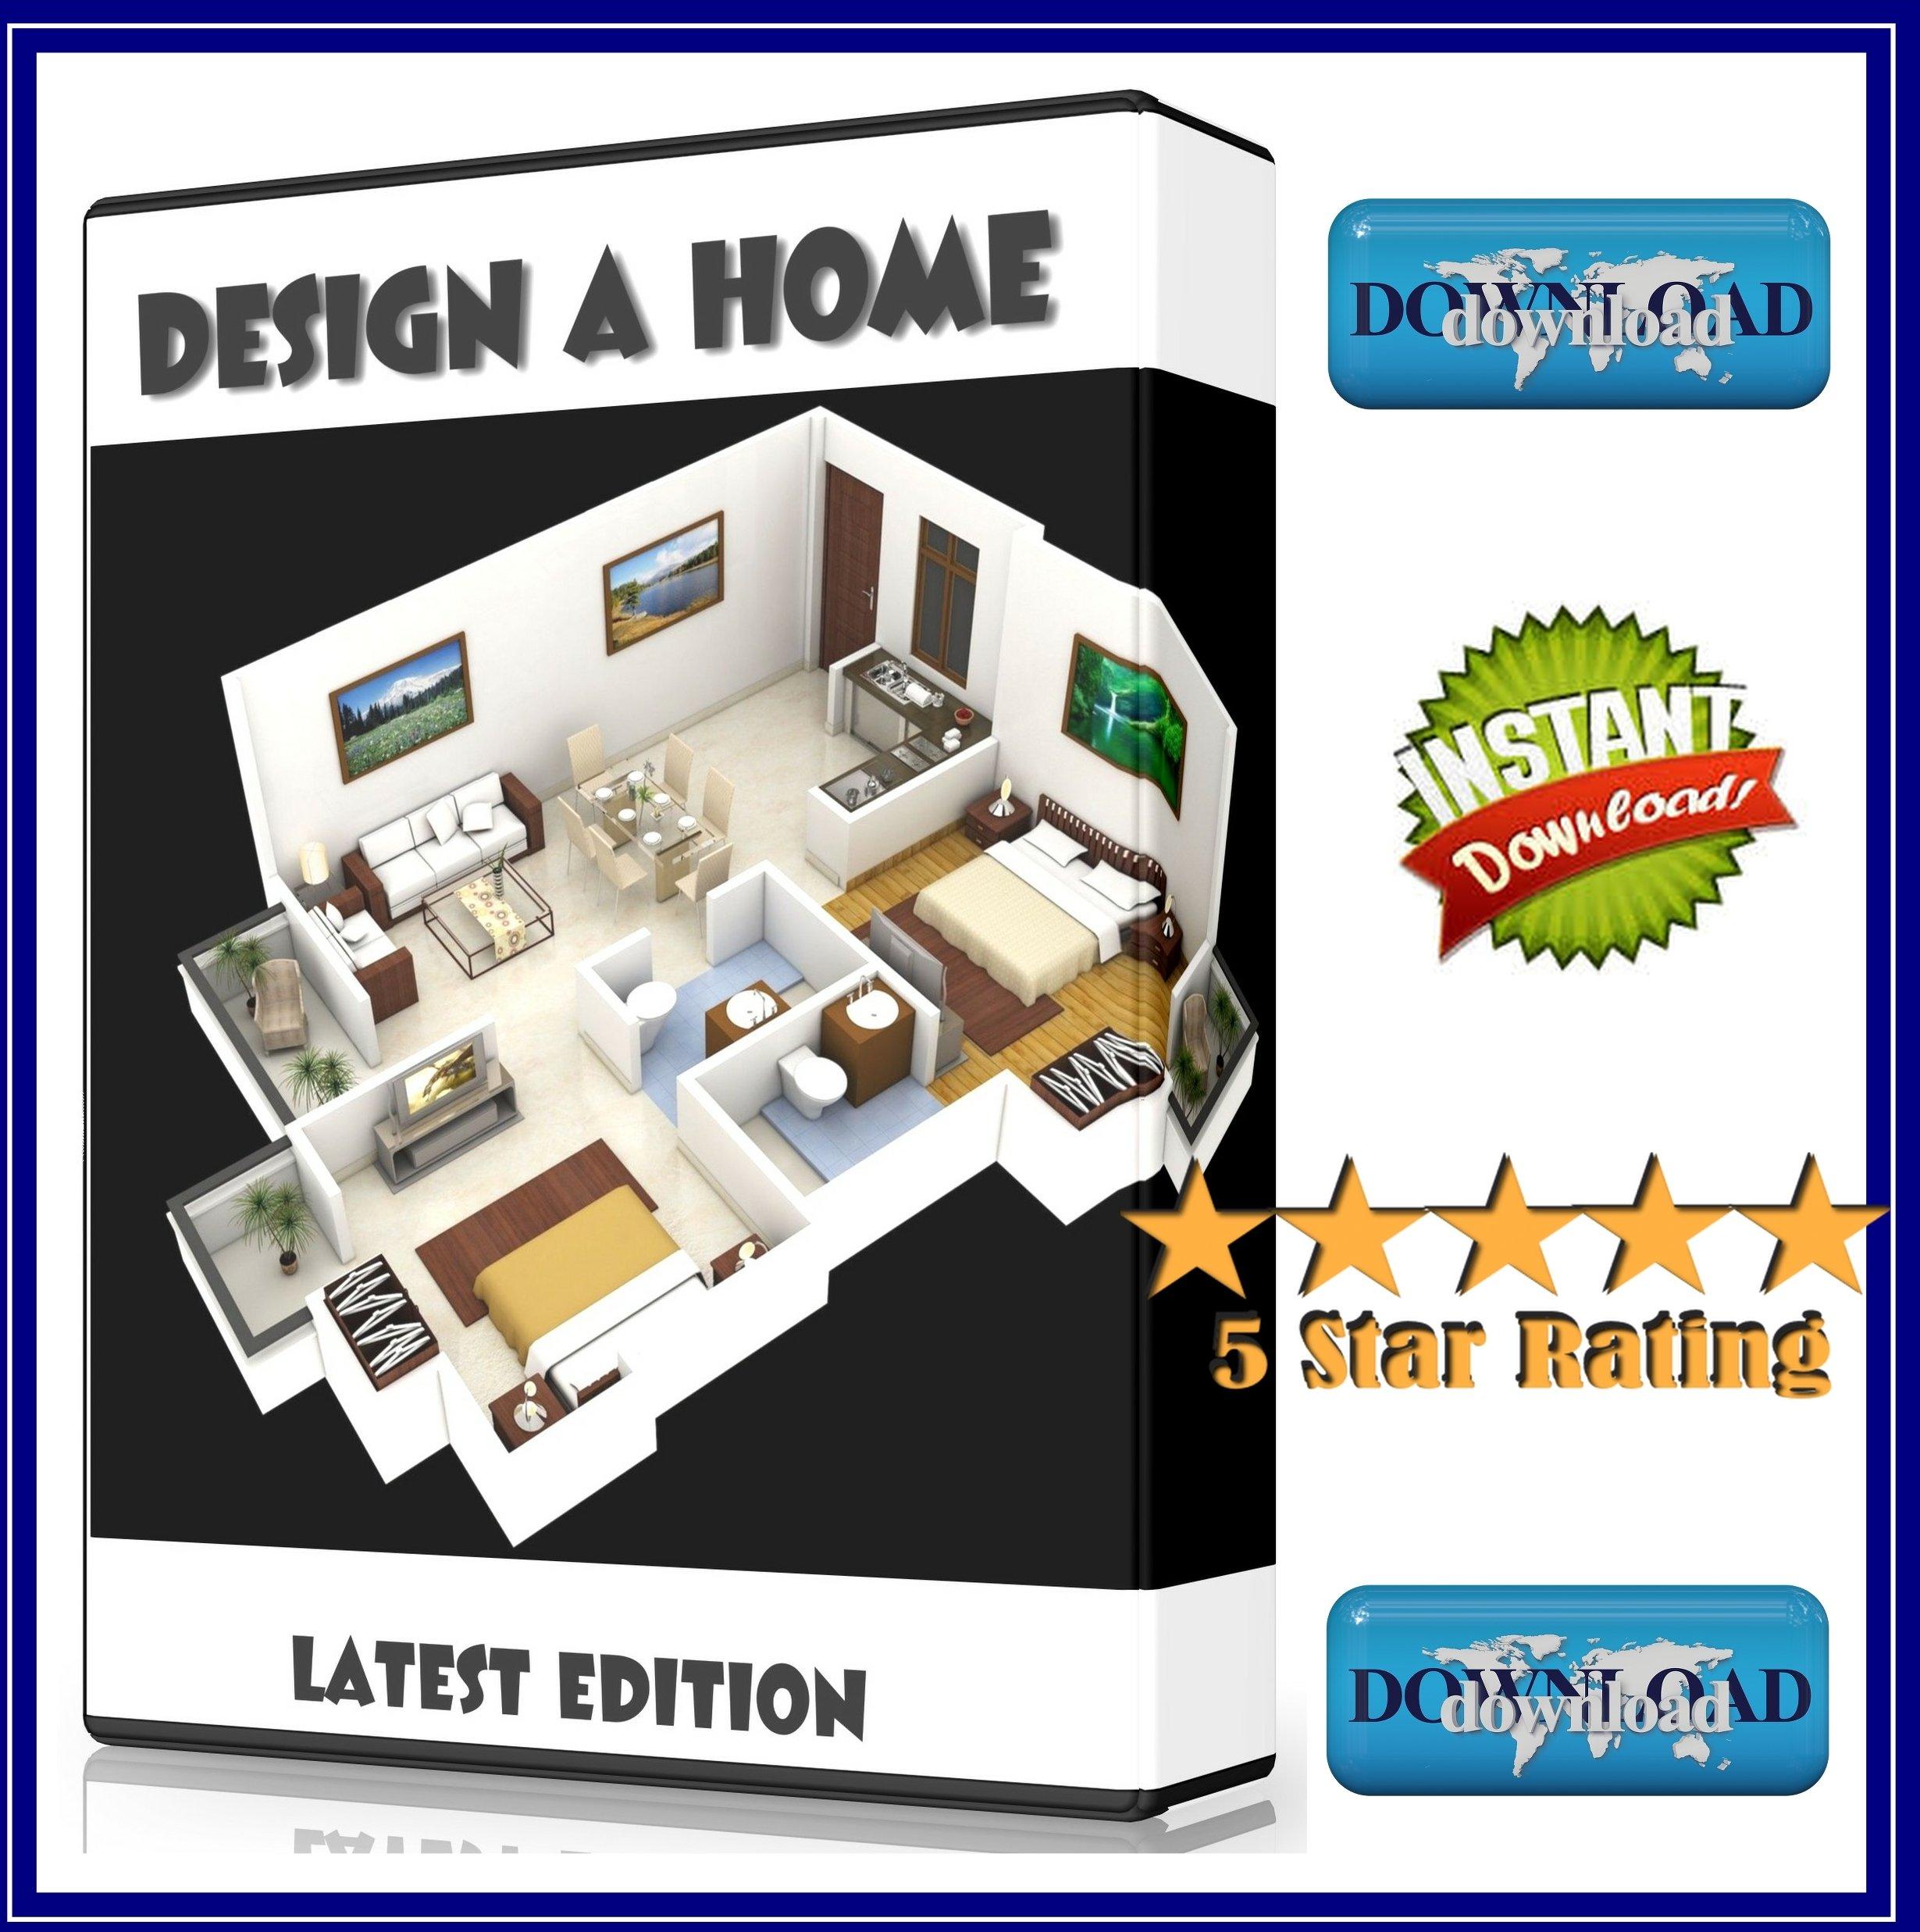 DESIGNER HOUSE BATHROOM KITCHEN PLANNER SOFTWARE DOWNLOAD